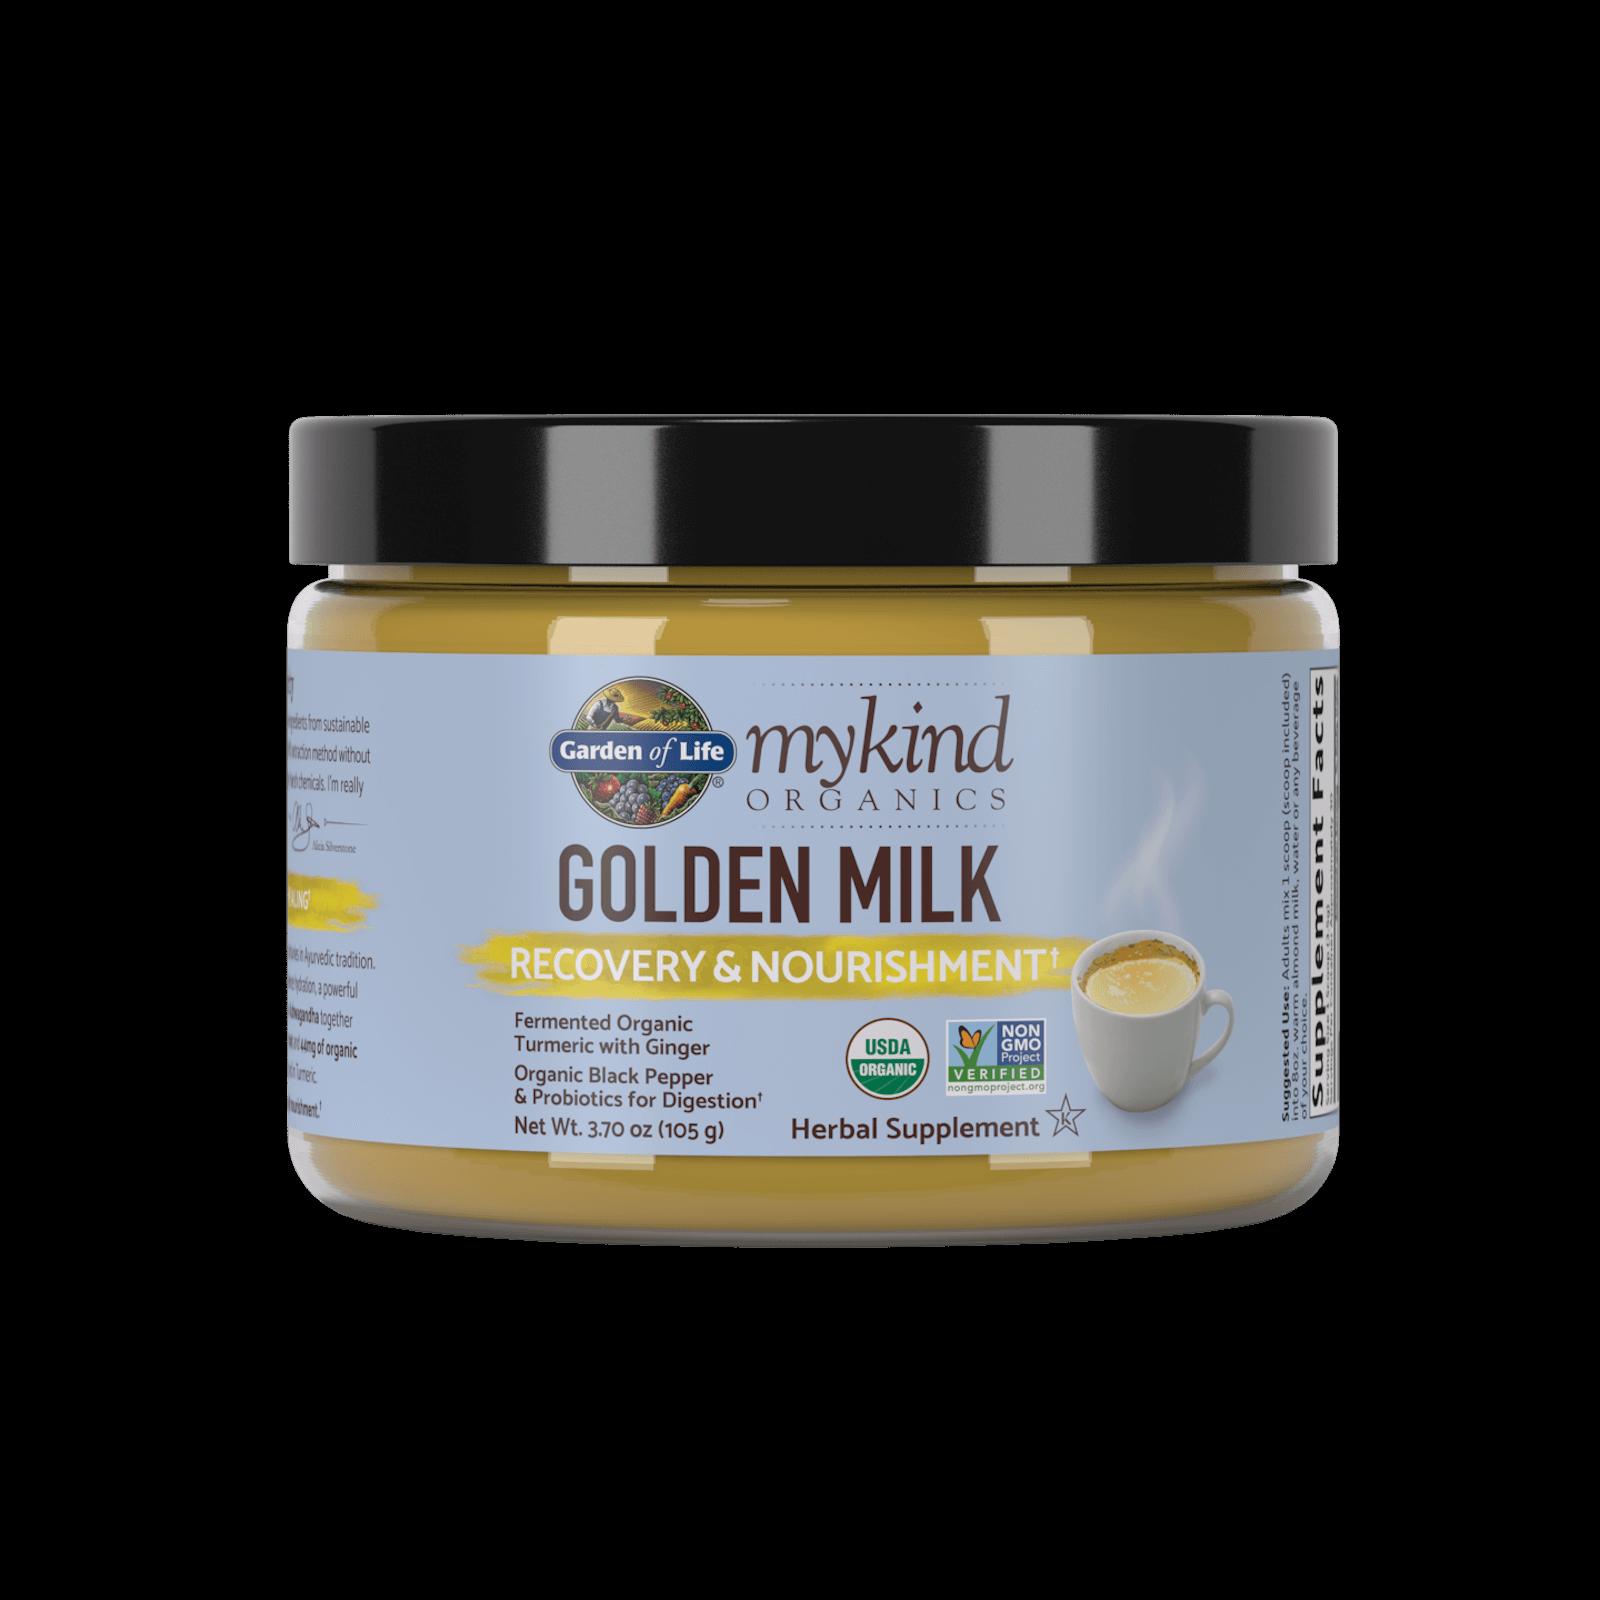 mykind Organics Kruiden Gouden Poeder - 105g